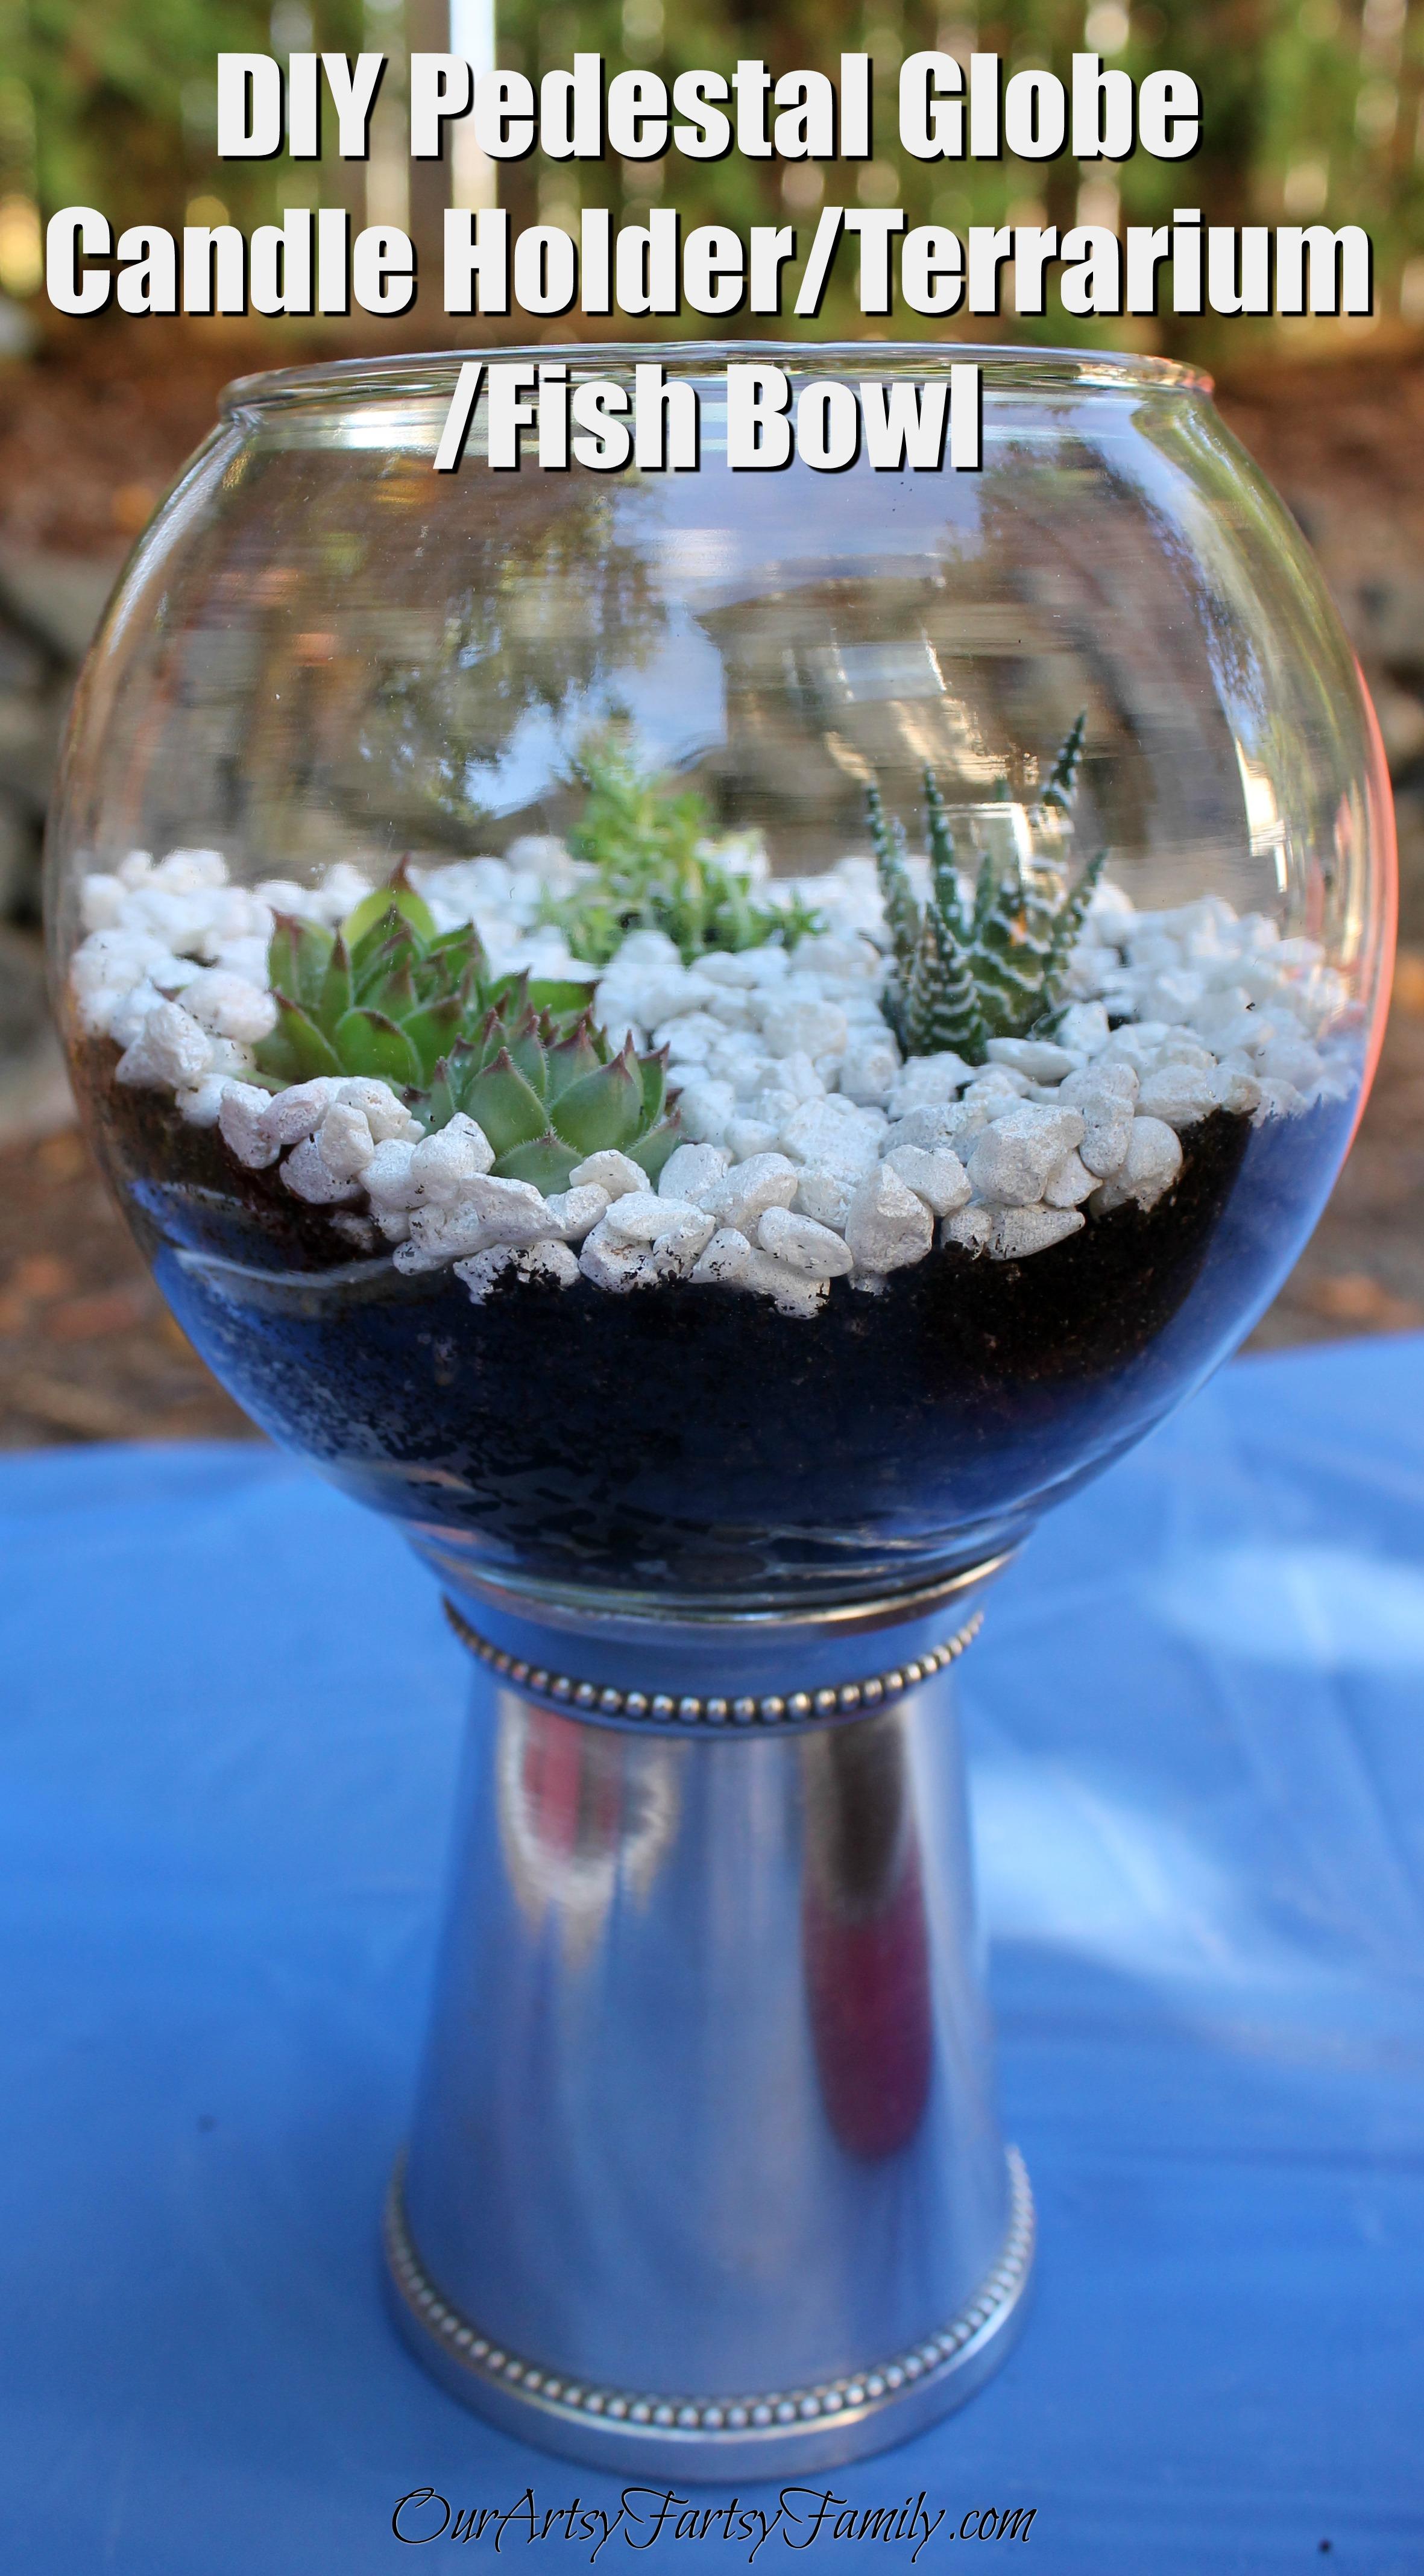 DIY Pedestal Globe 4